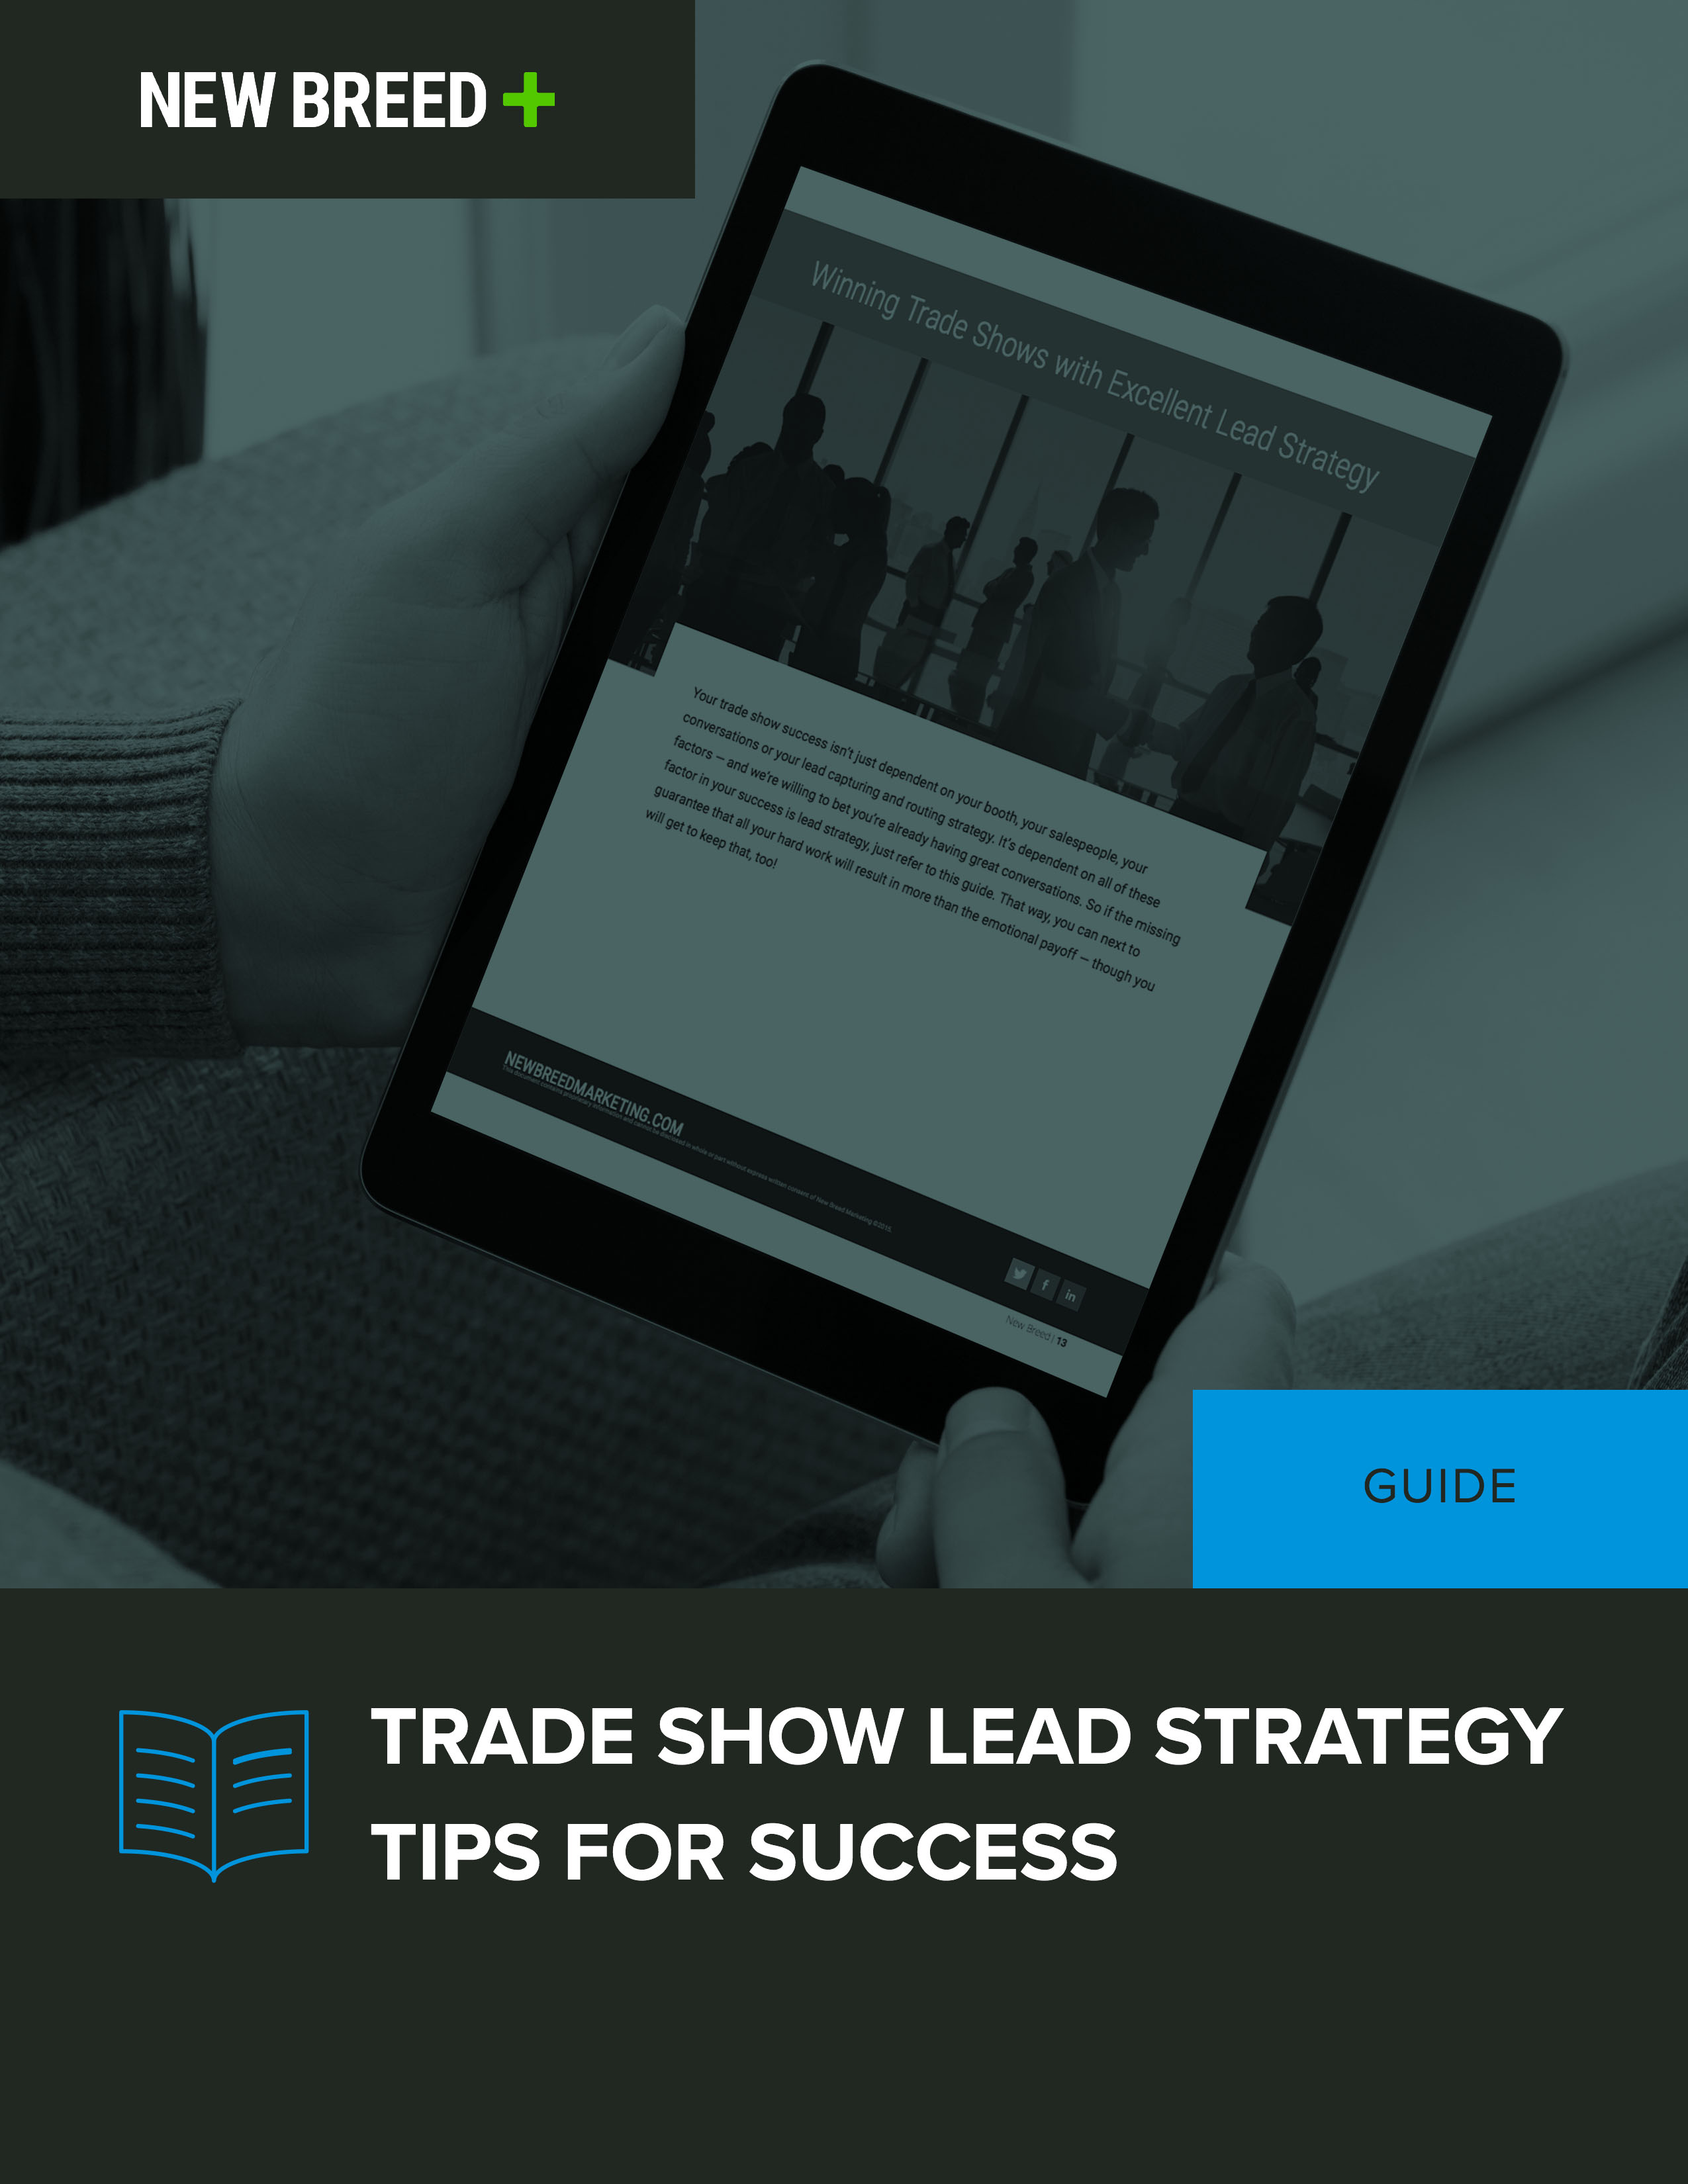 trade show tips for success.jpg